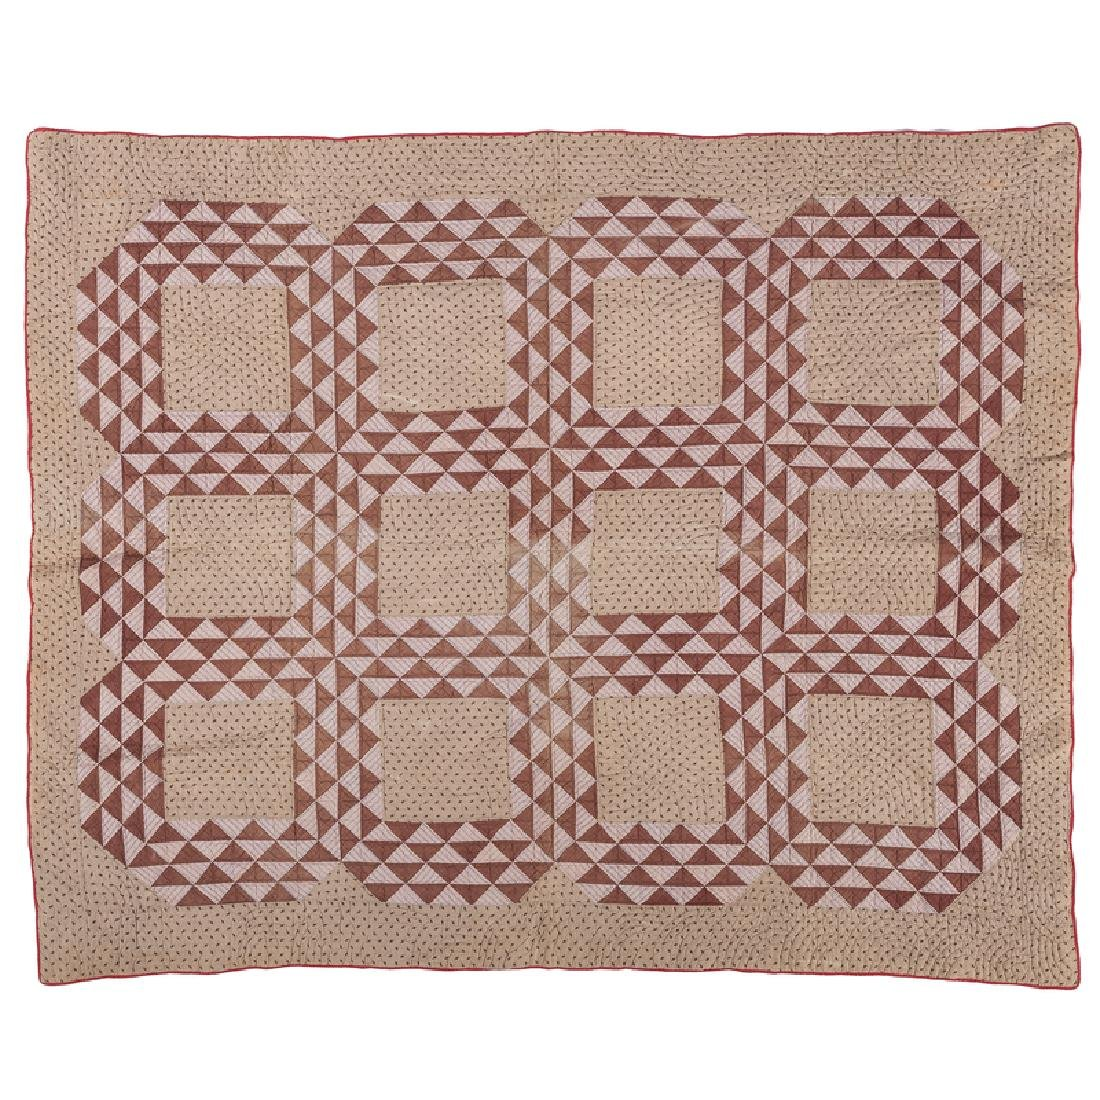 Twelve Patch Sawtooth Quilt